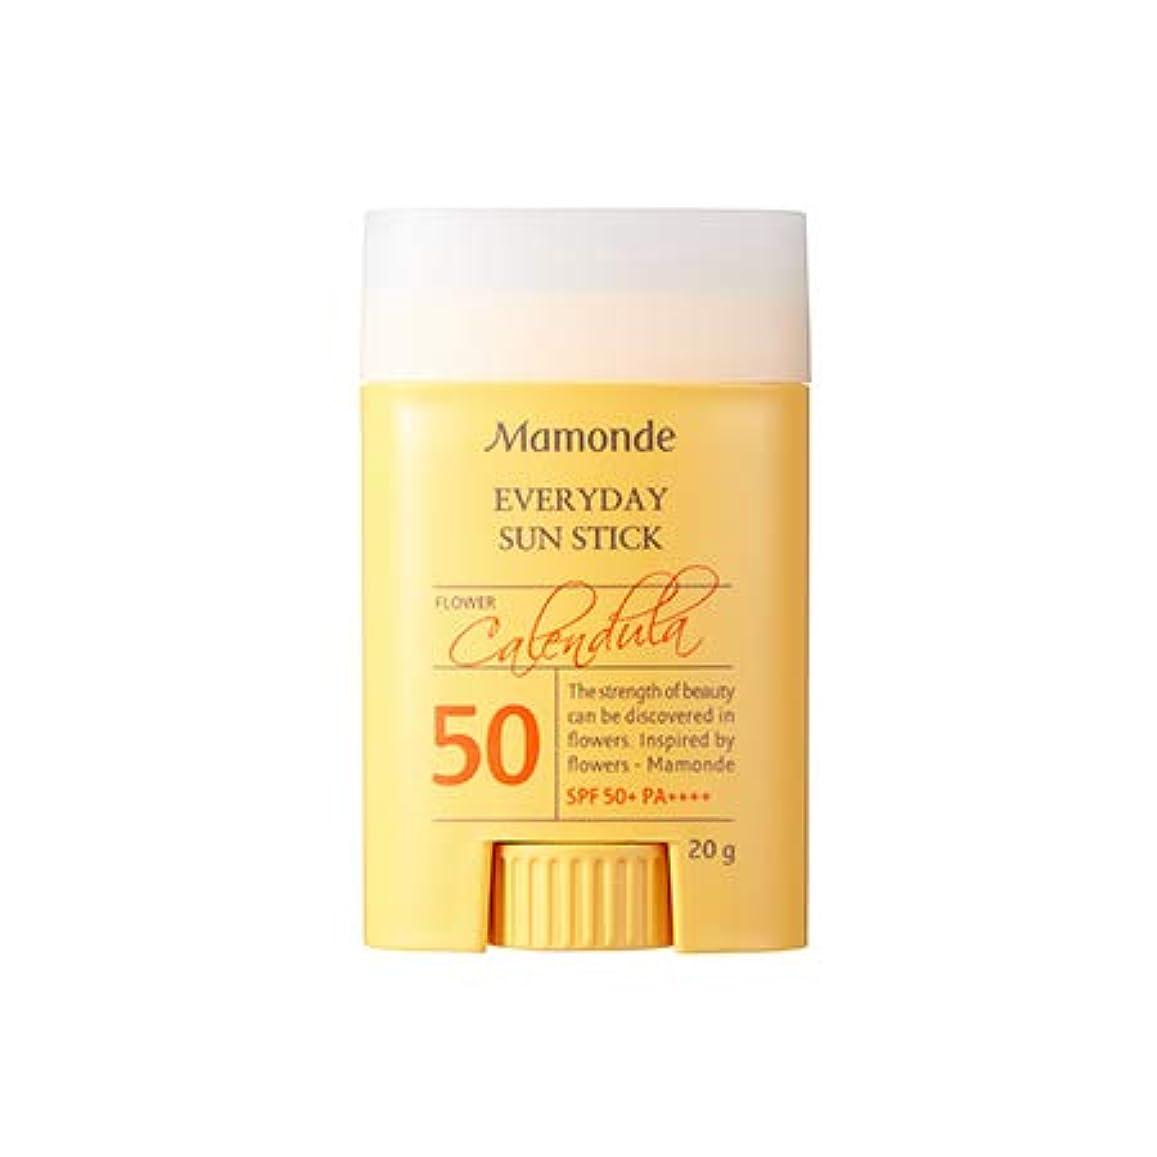 Mamonde Everyday Sun Stick 20g マモンド エブリデーサンスティック (SPF50+/PA++++) [並行輸入品]